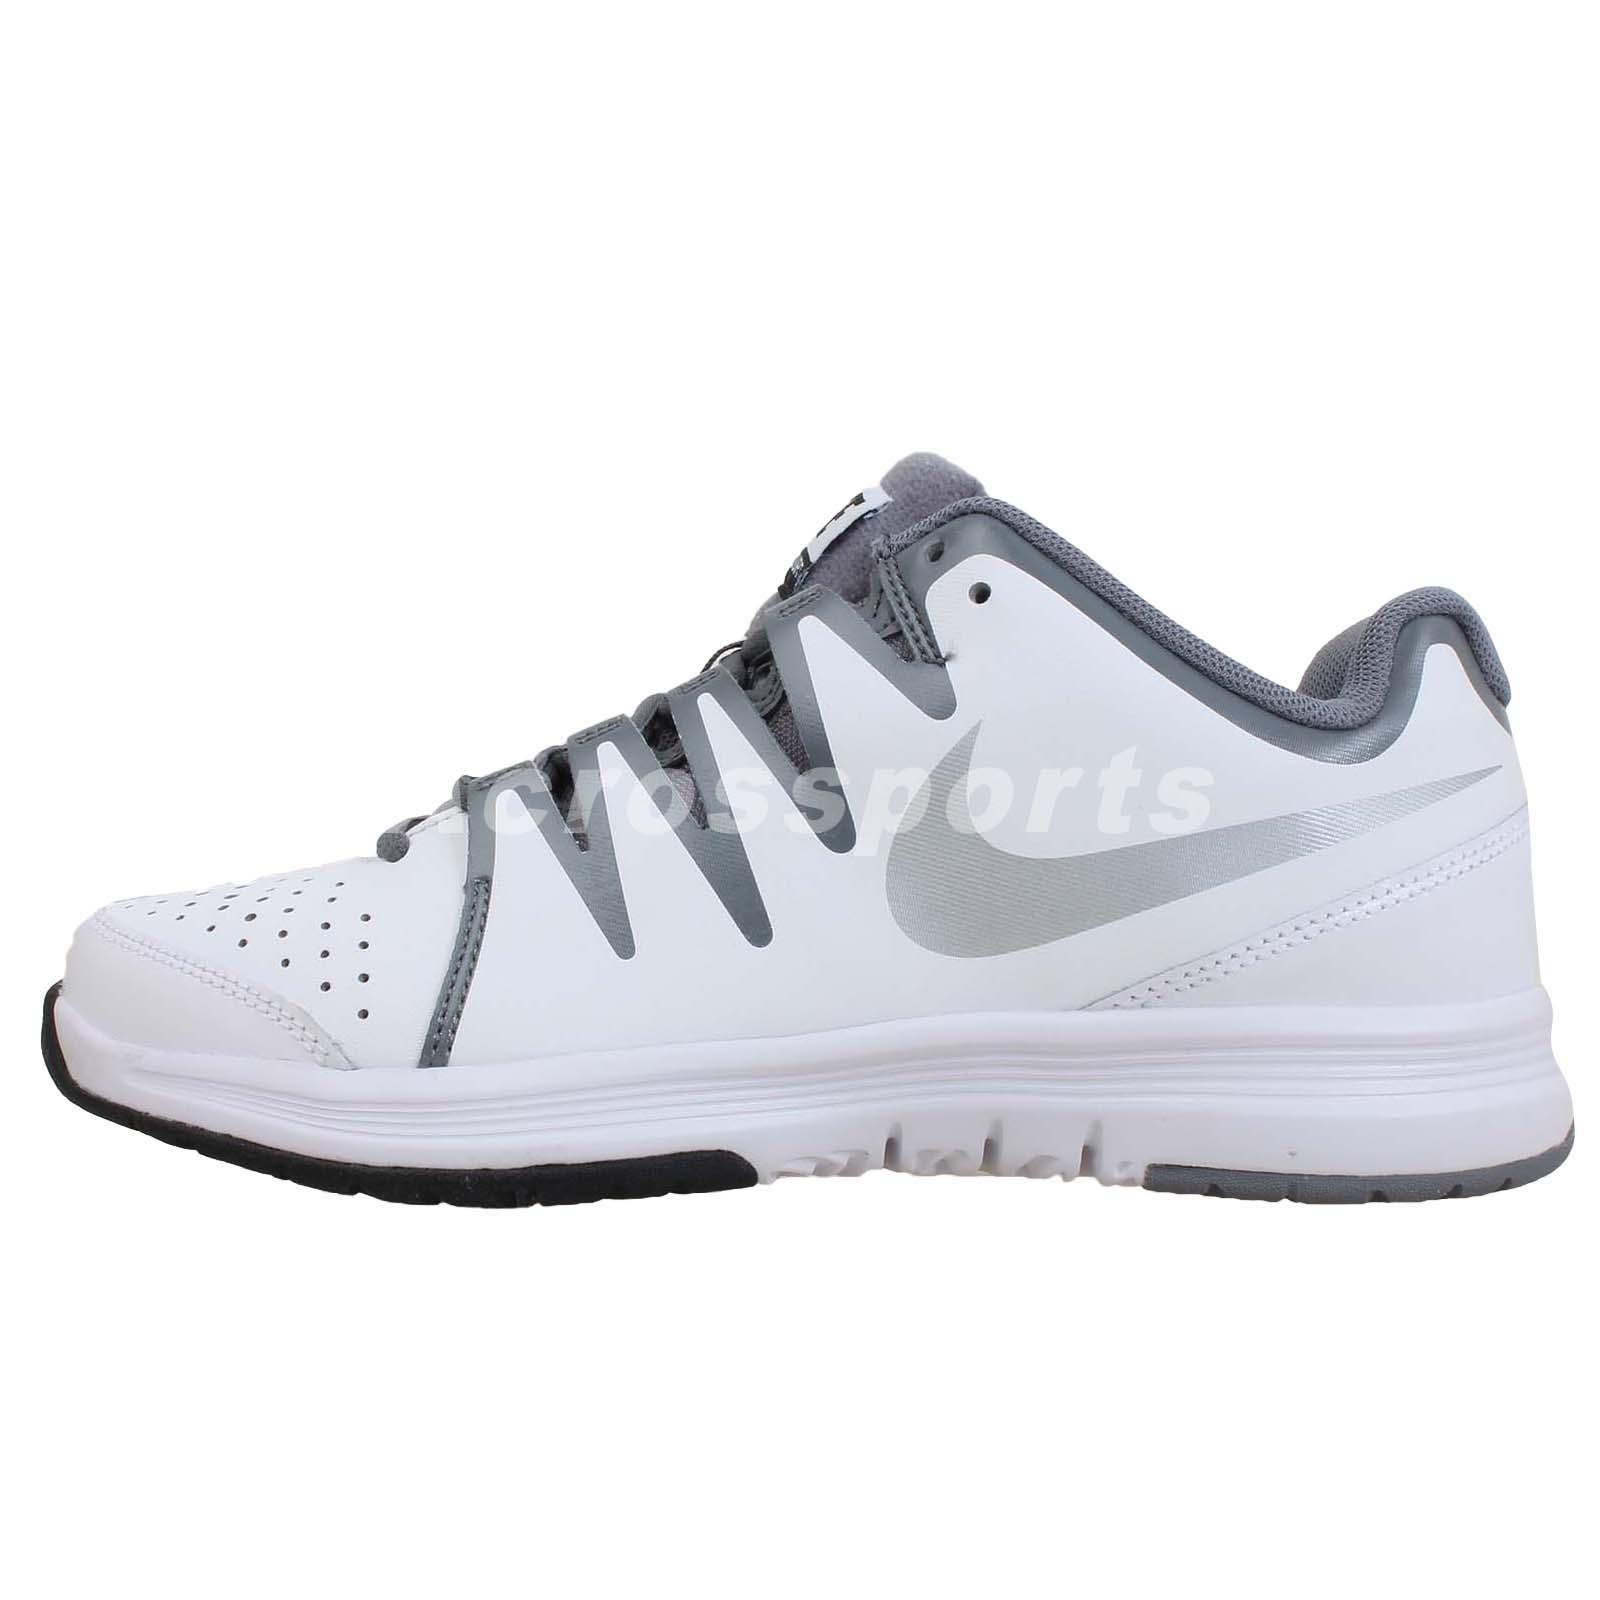 Wmns Nike Vapor Court White Silver Grey Womens Tennis ...